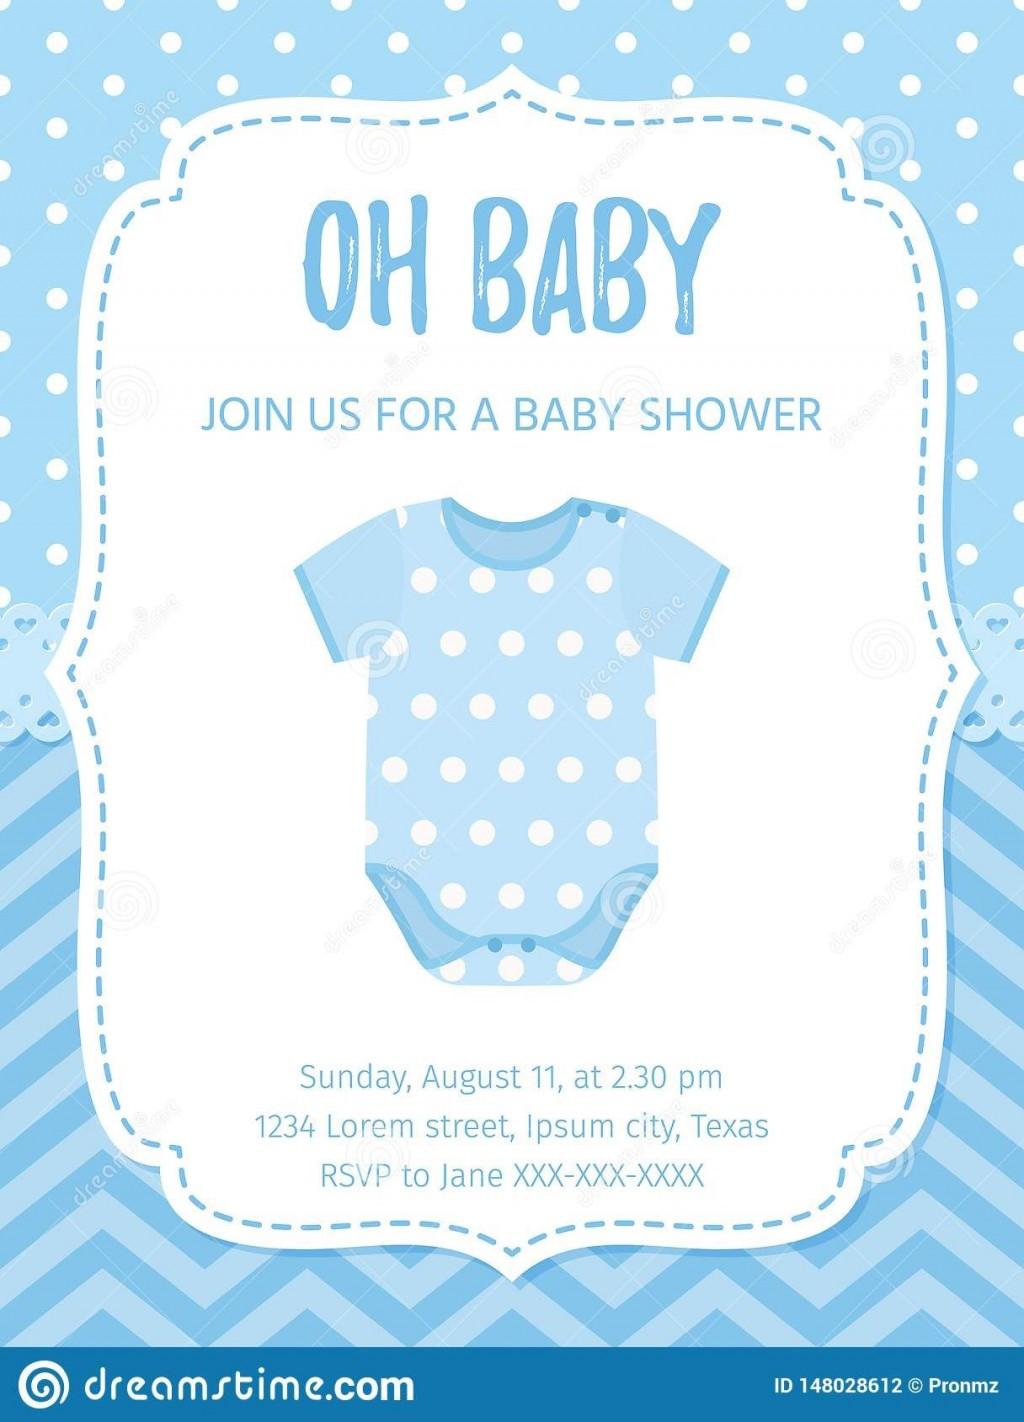 002 Stunning Baby Shower Card Design Free High Resolution  Template Microsoft Word Boy DownloadLarge